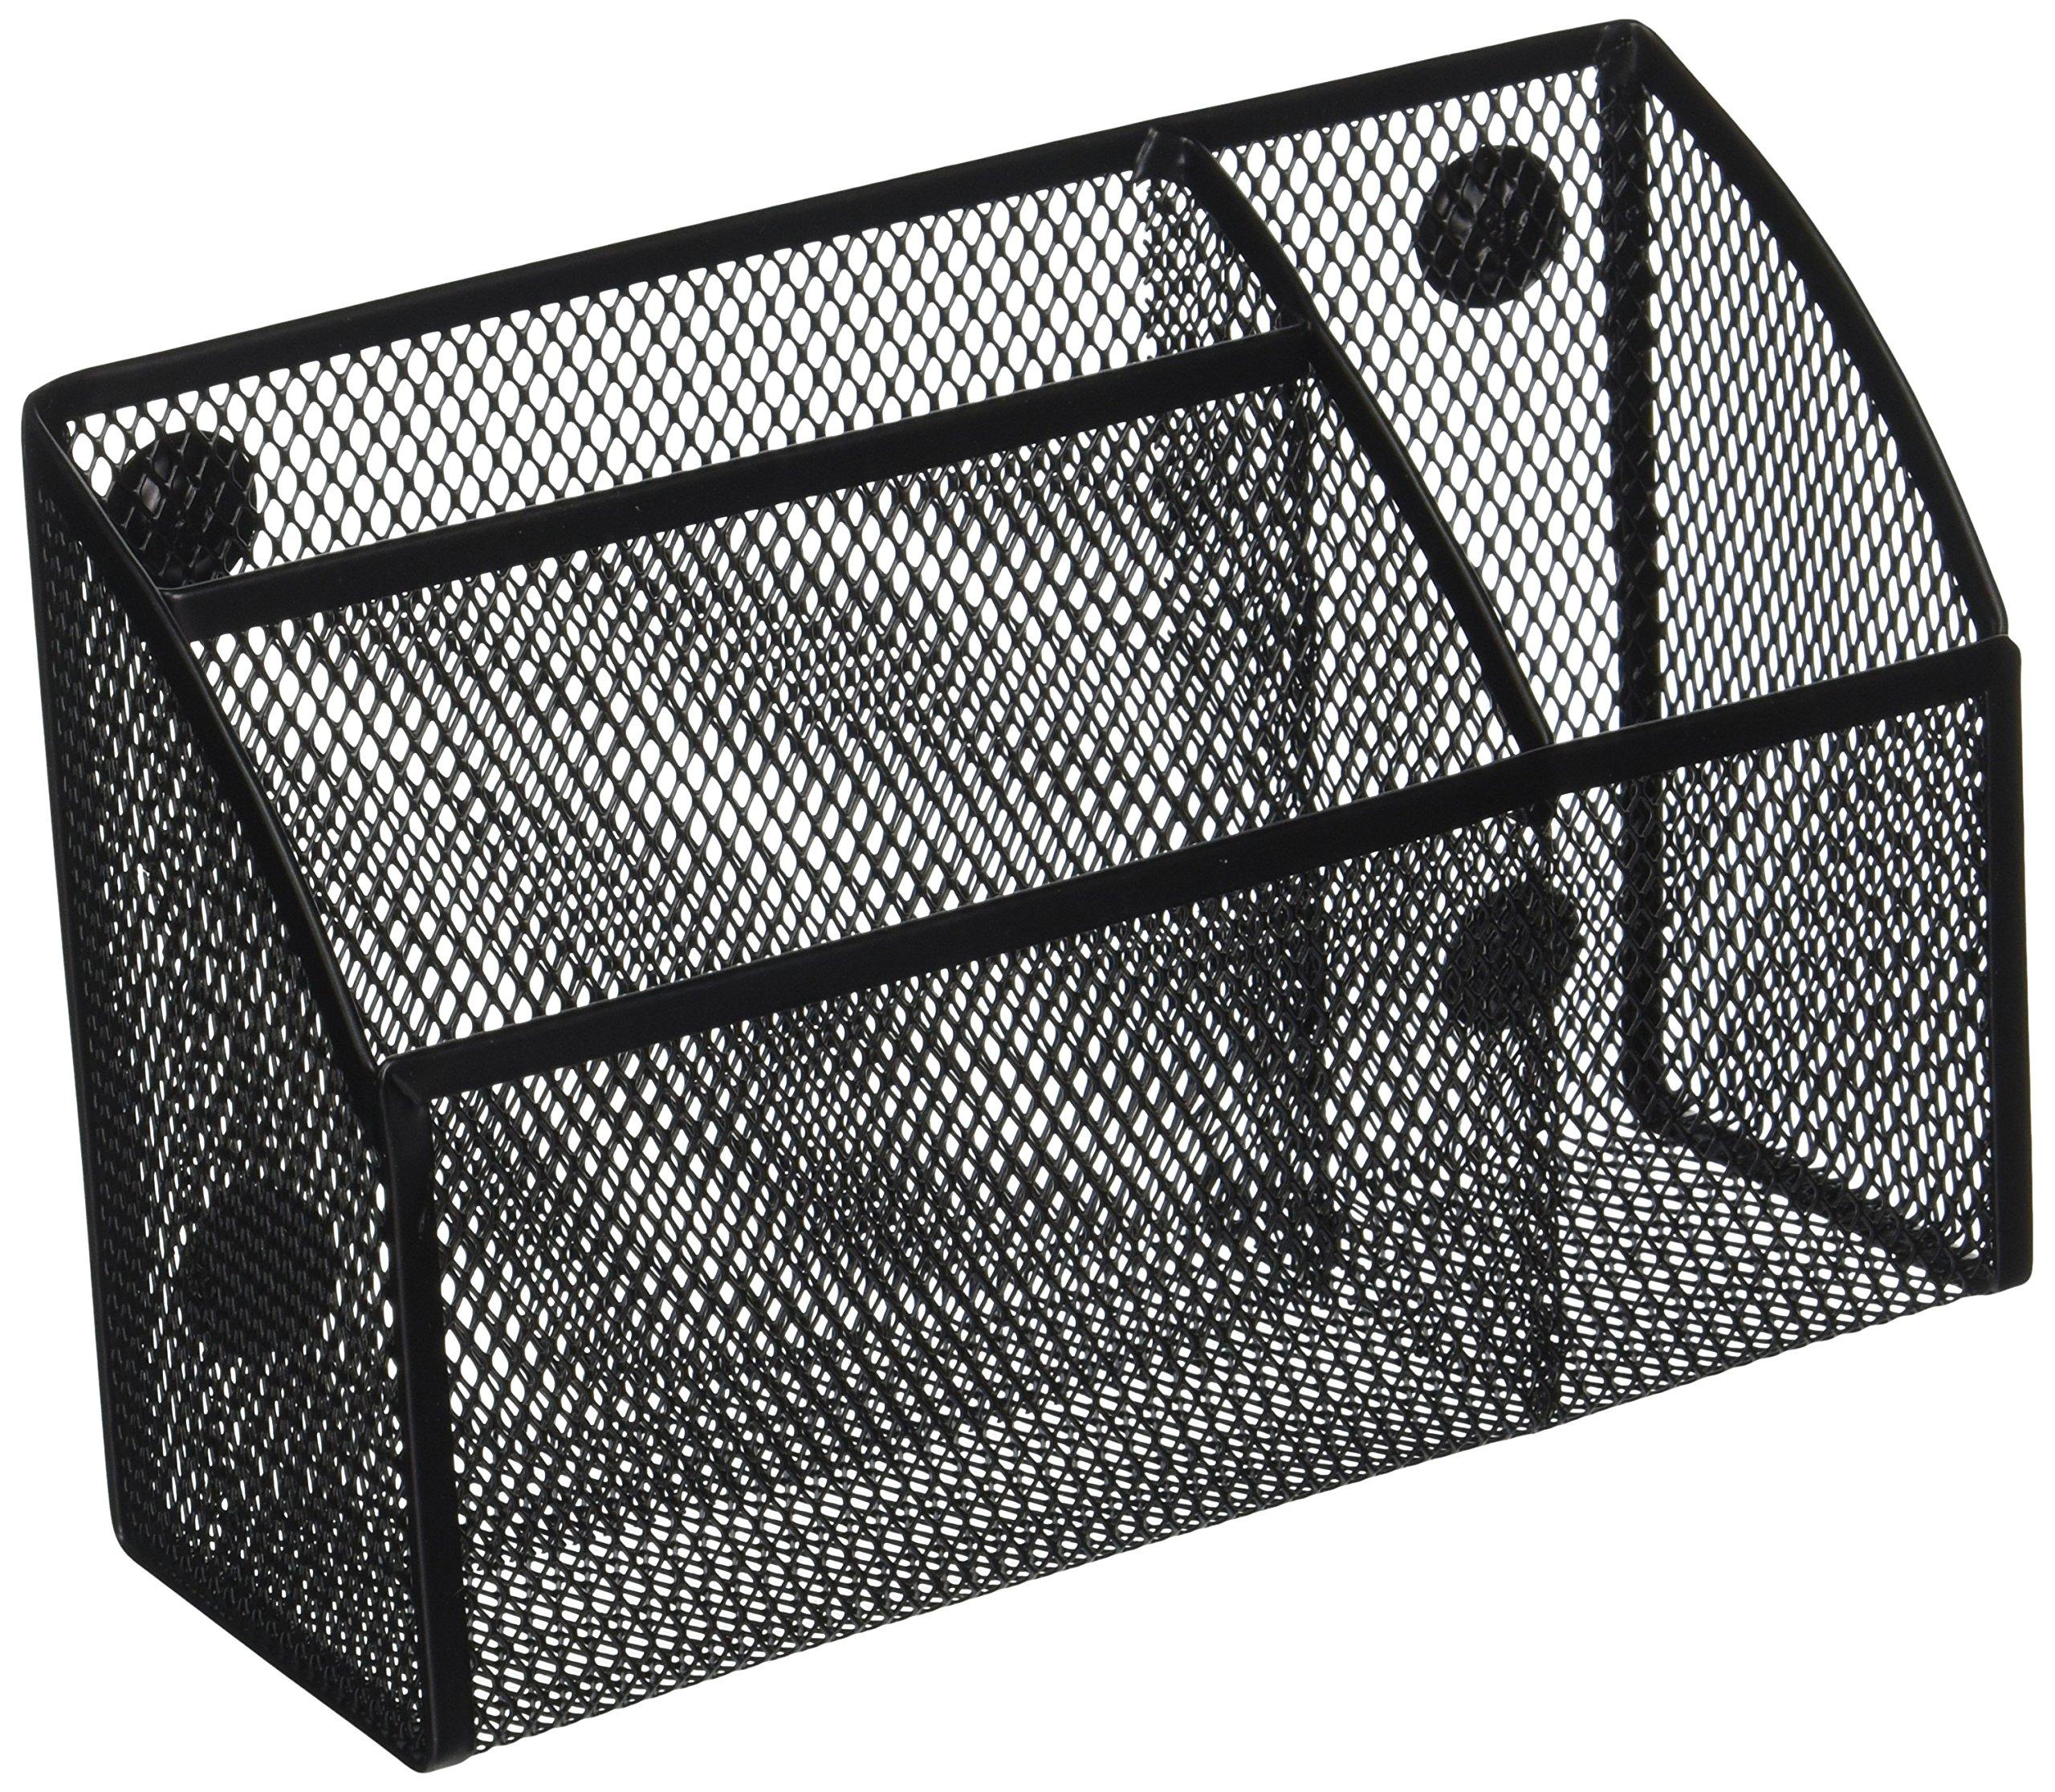 Honey-Can-Do OFC-06211 Mesh Magnetic Organizer, 2.75 x 7.5 x 4.75, Black